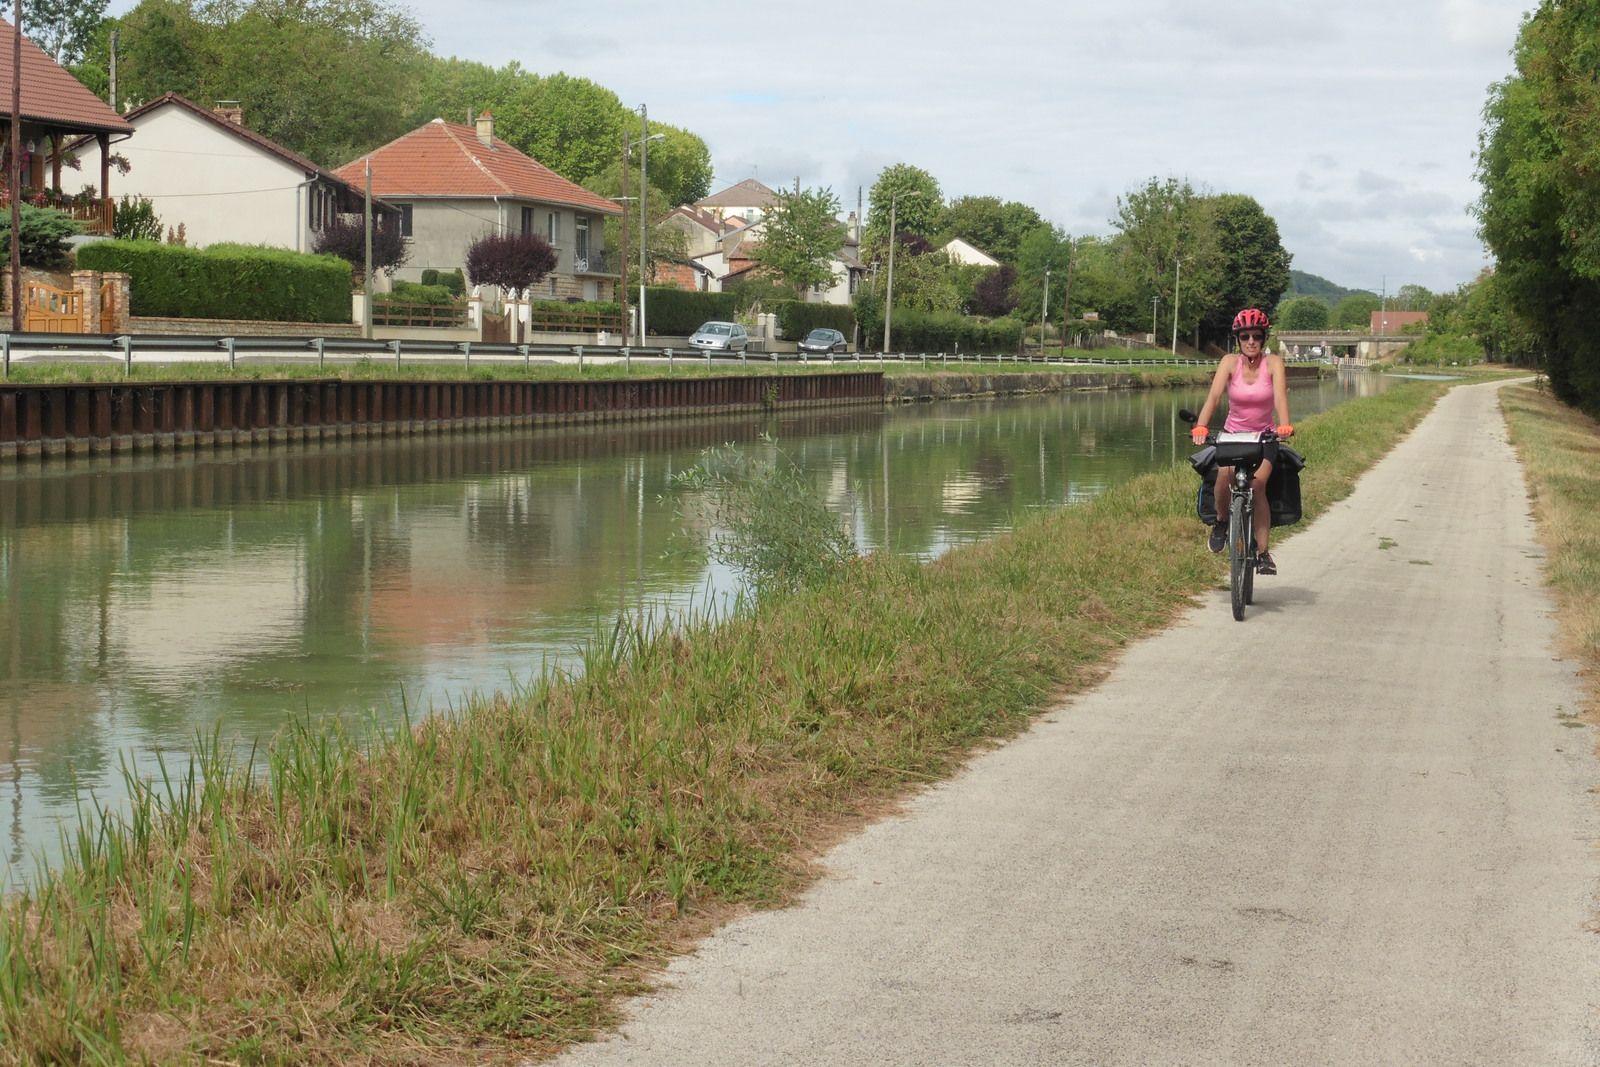 Le Tour de Bourgogne - Etape 2 - Buffon/Maconge - 77,7 km